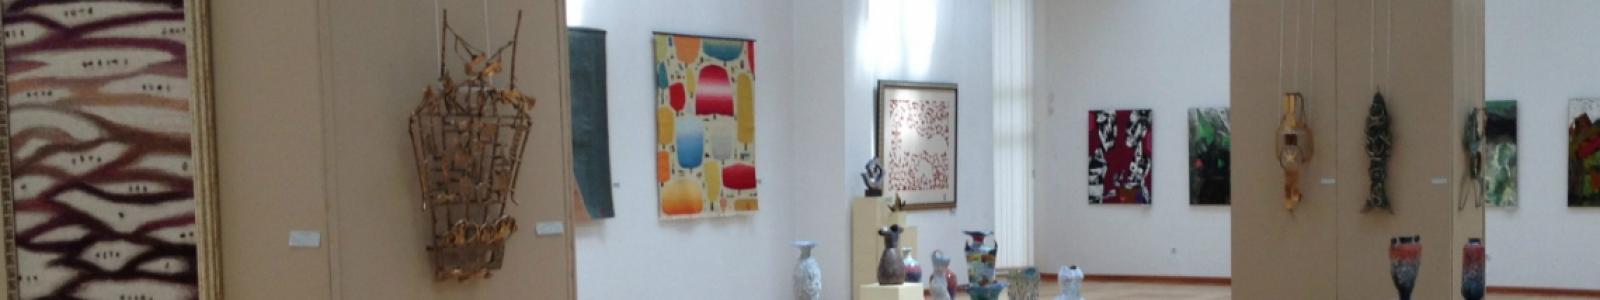 Gallery Painter Mukhtar Syzdykov